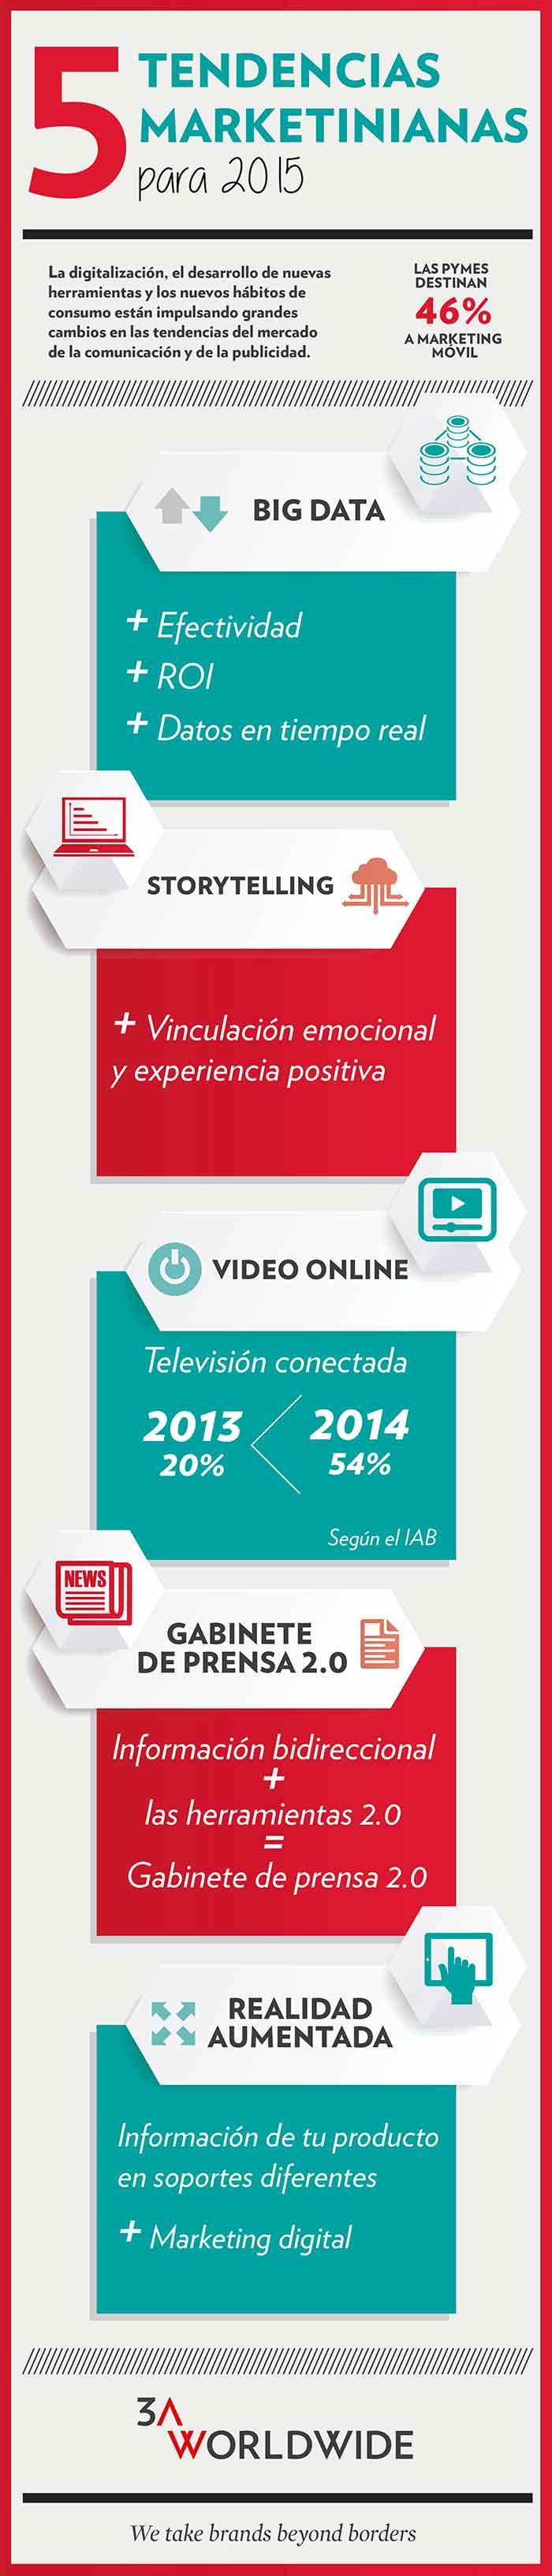 Infografia sobre las tendencias marketinianas para 2015